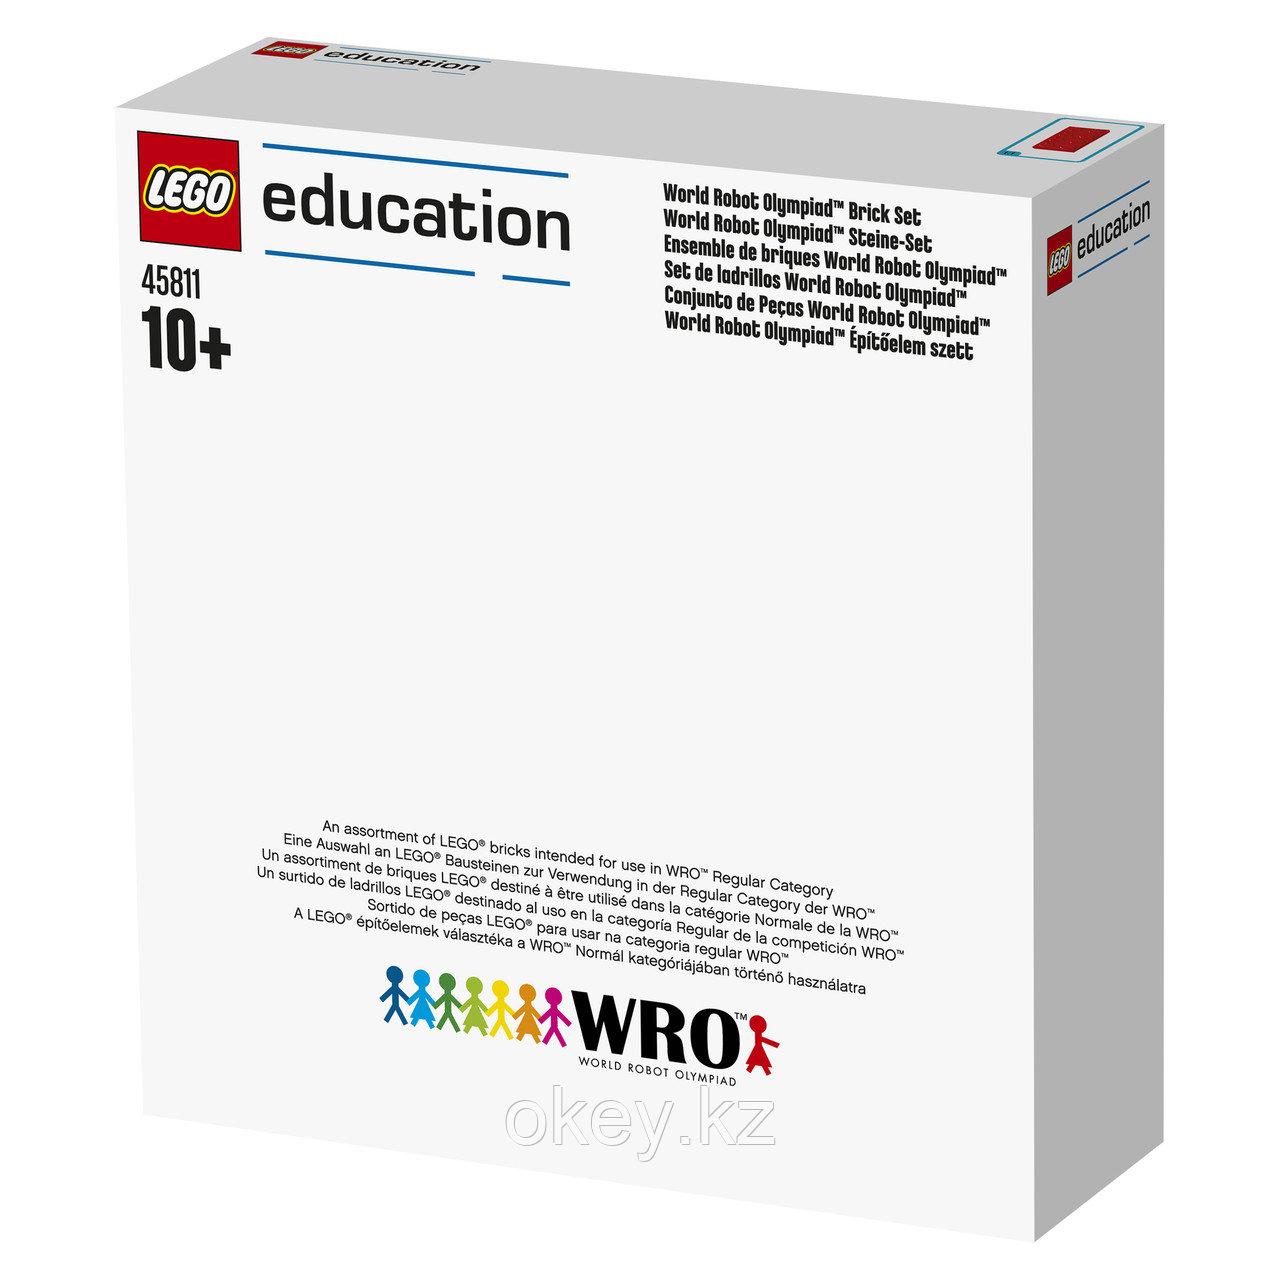 LEGO Education: Комплект World Robot Olympiad (WRO) 45811